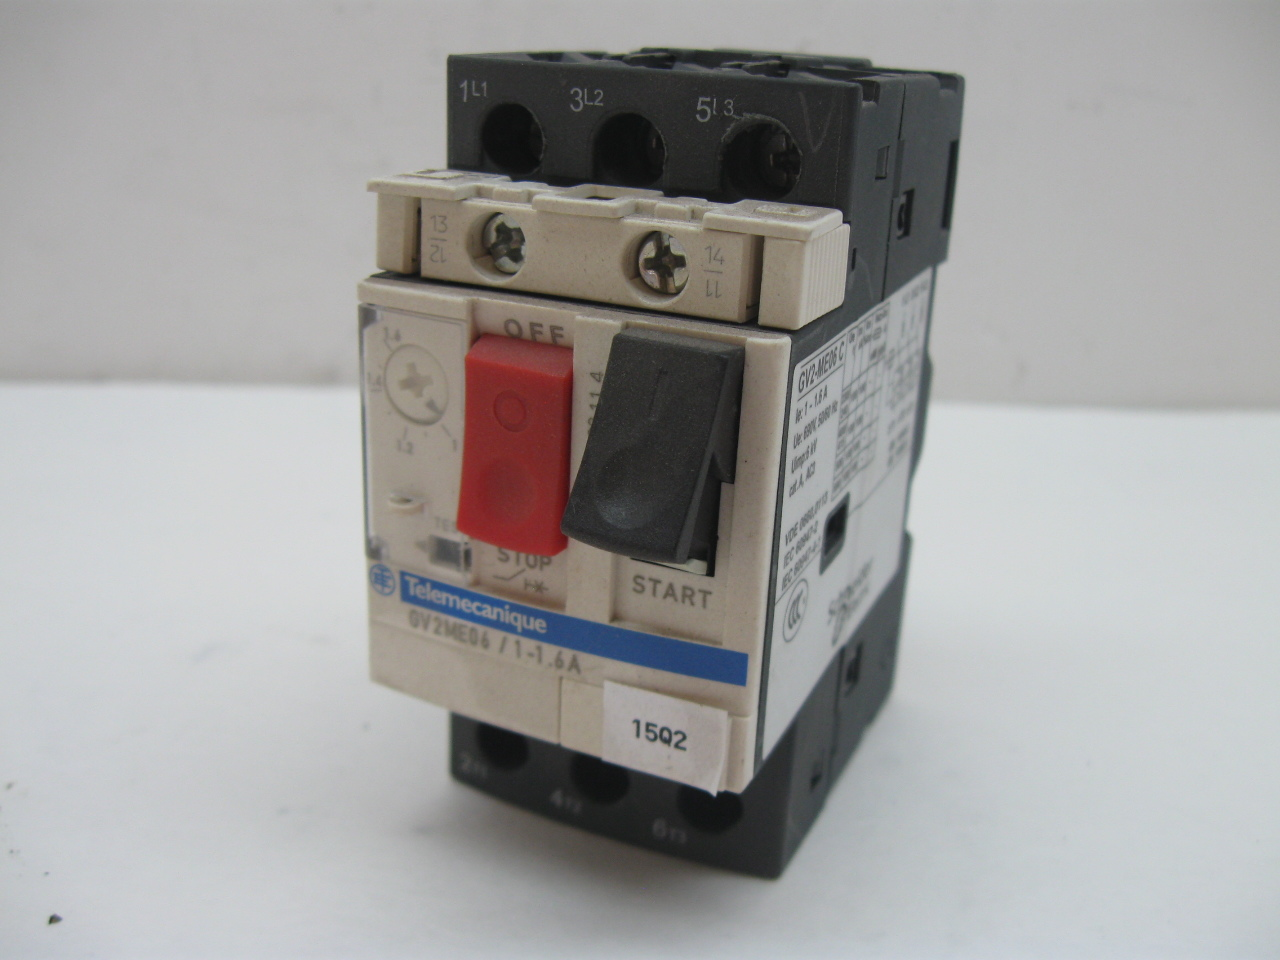 Telemecanique gv2 me06 1 1 6a manual motor starter with adjustable overload Telemecanique motor starter